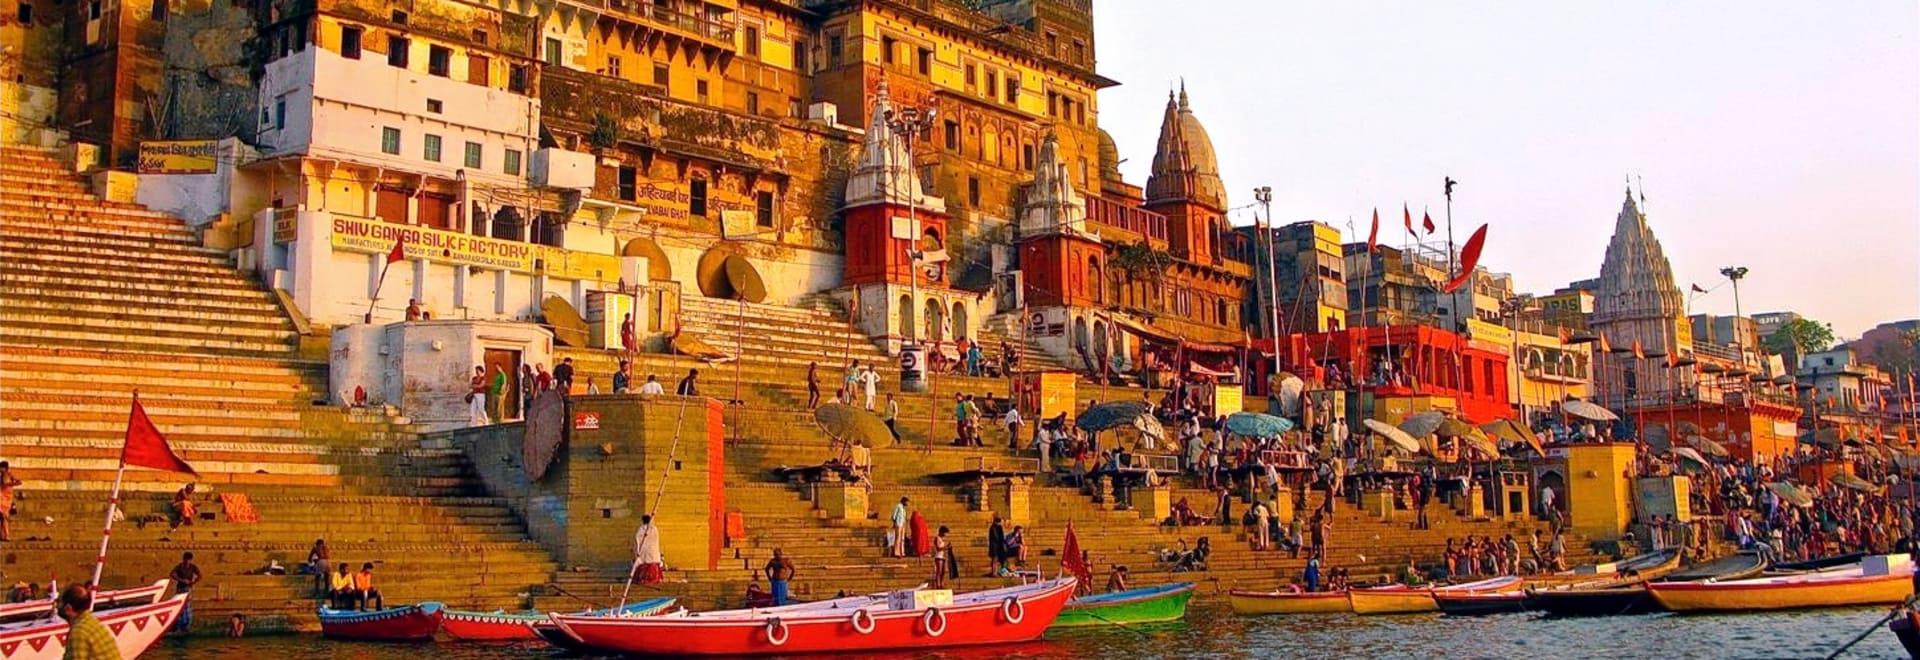 Varanasi-wikipedia.jpg